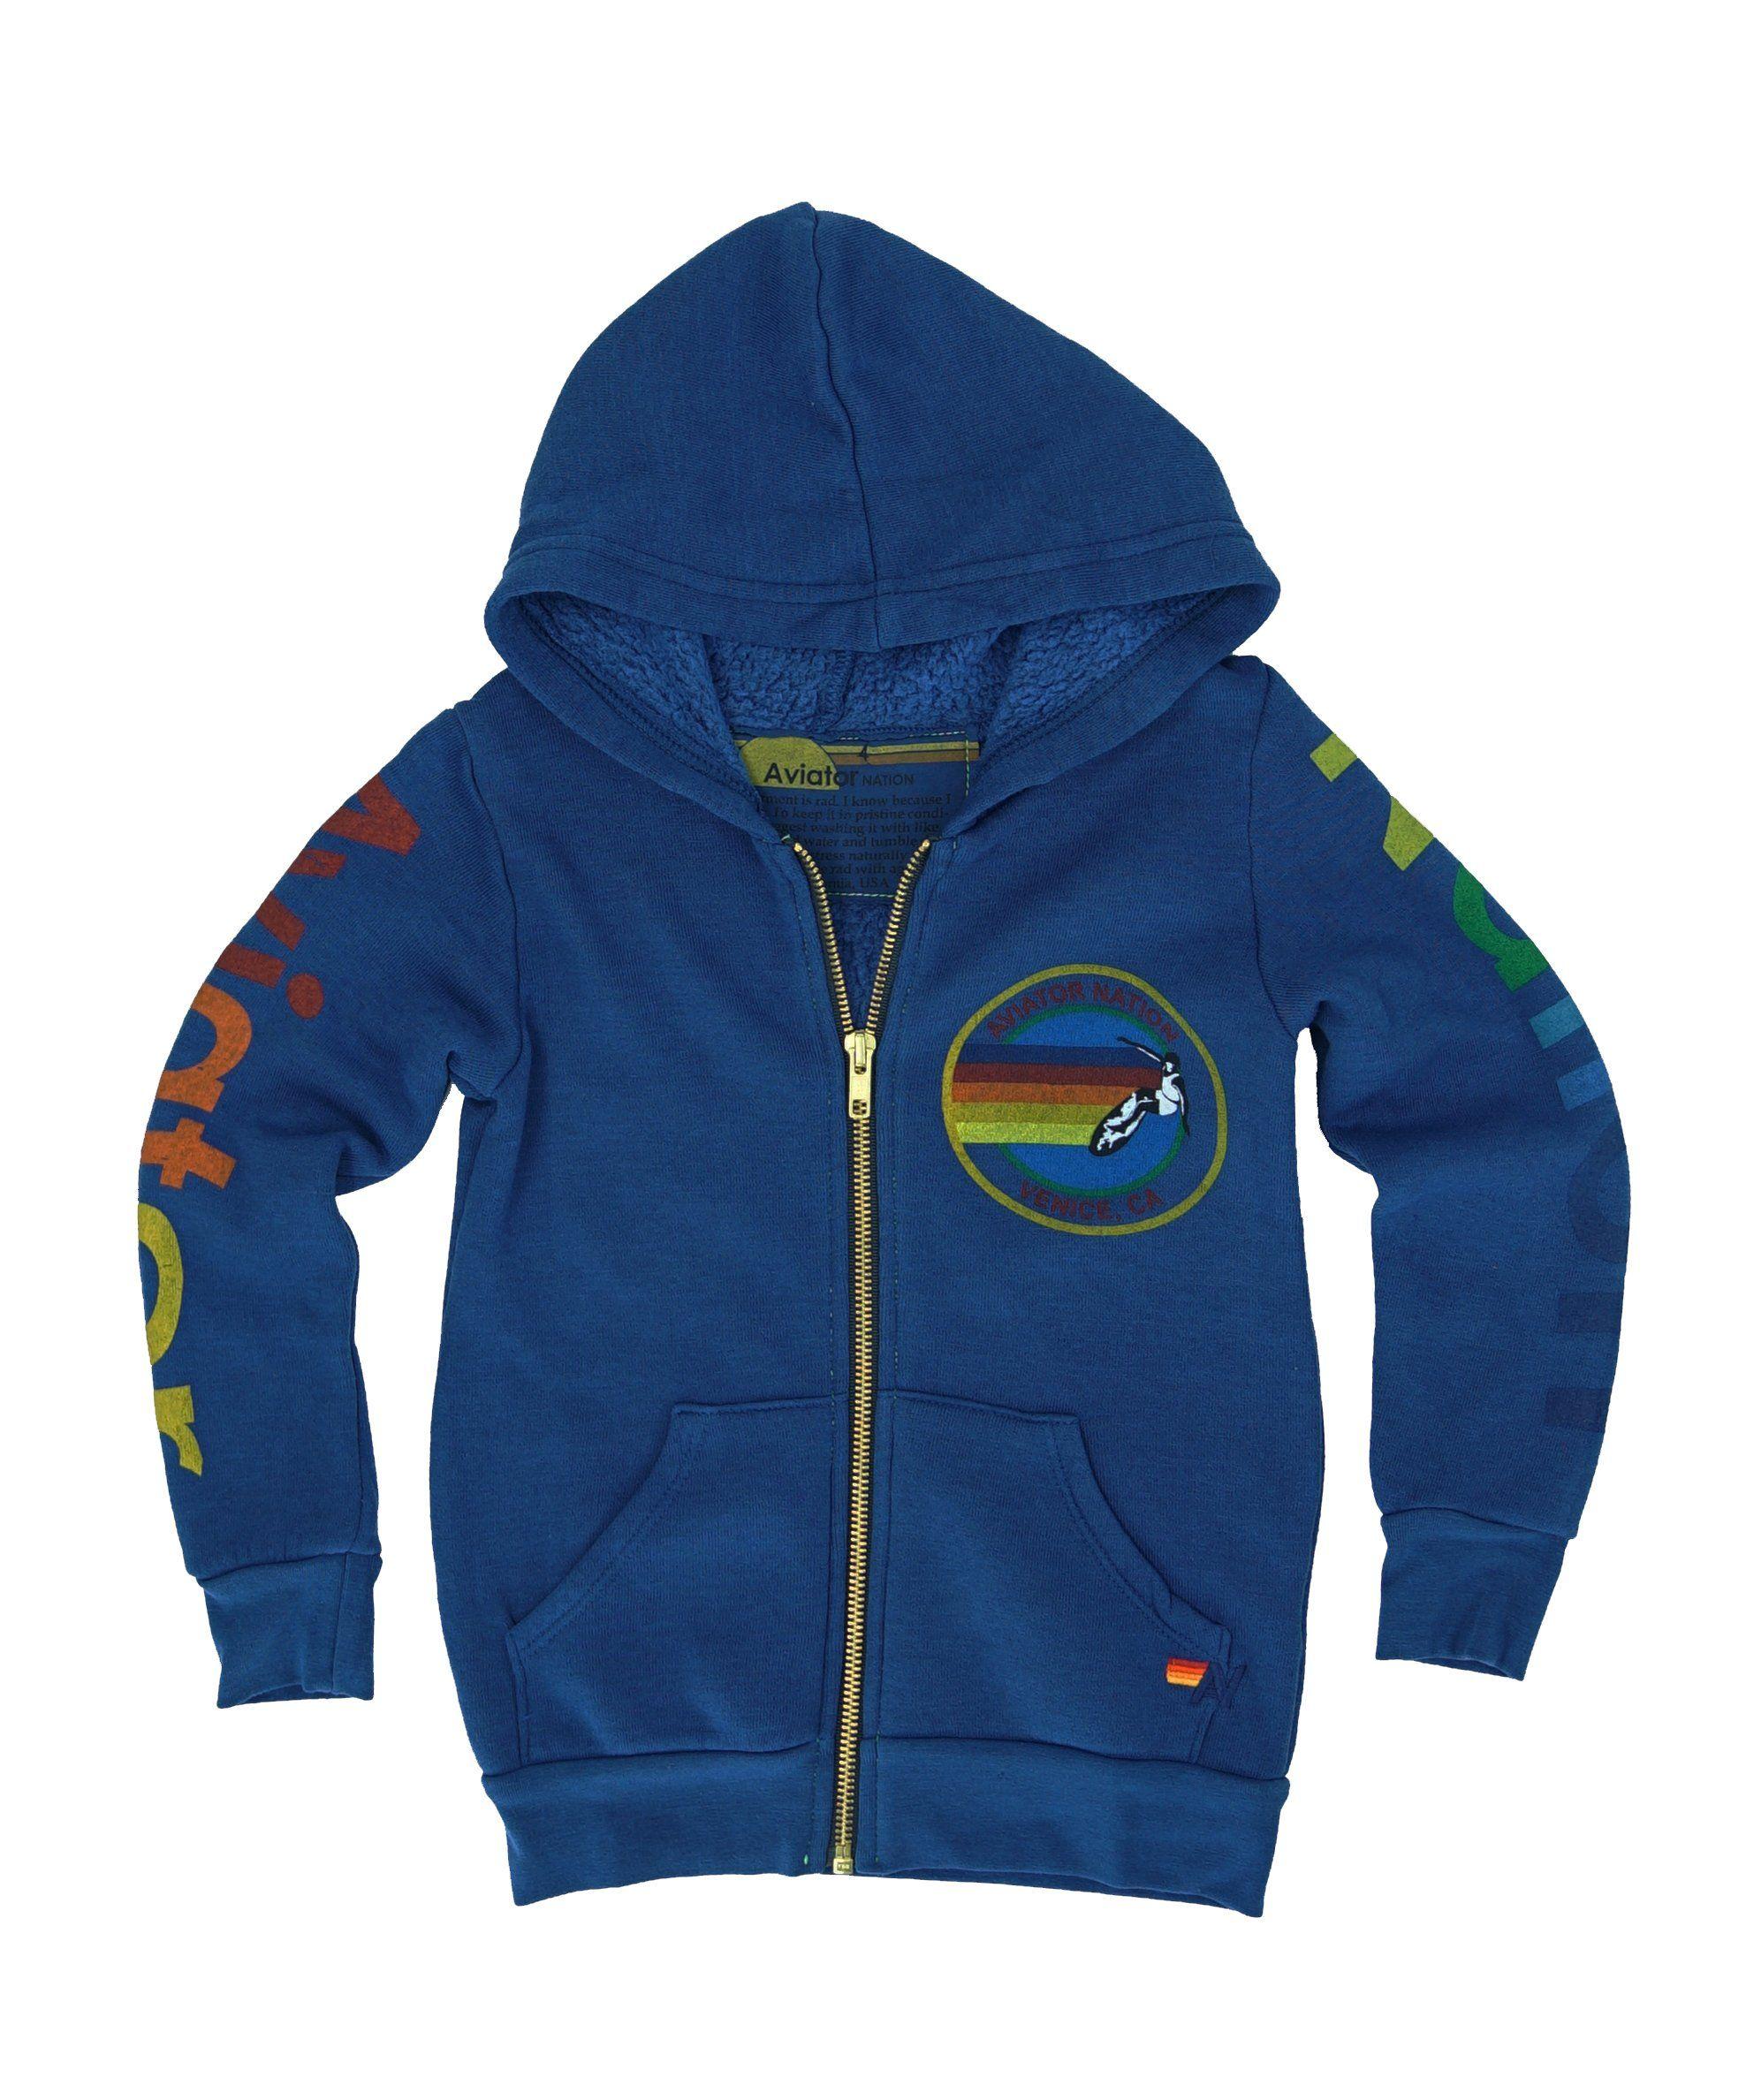 aviator nation kids aviation clothing brand